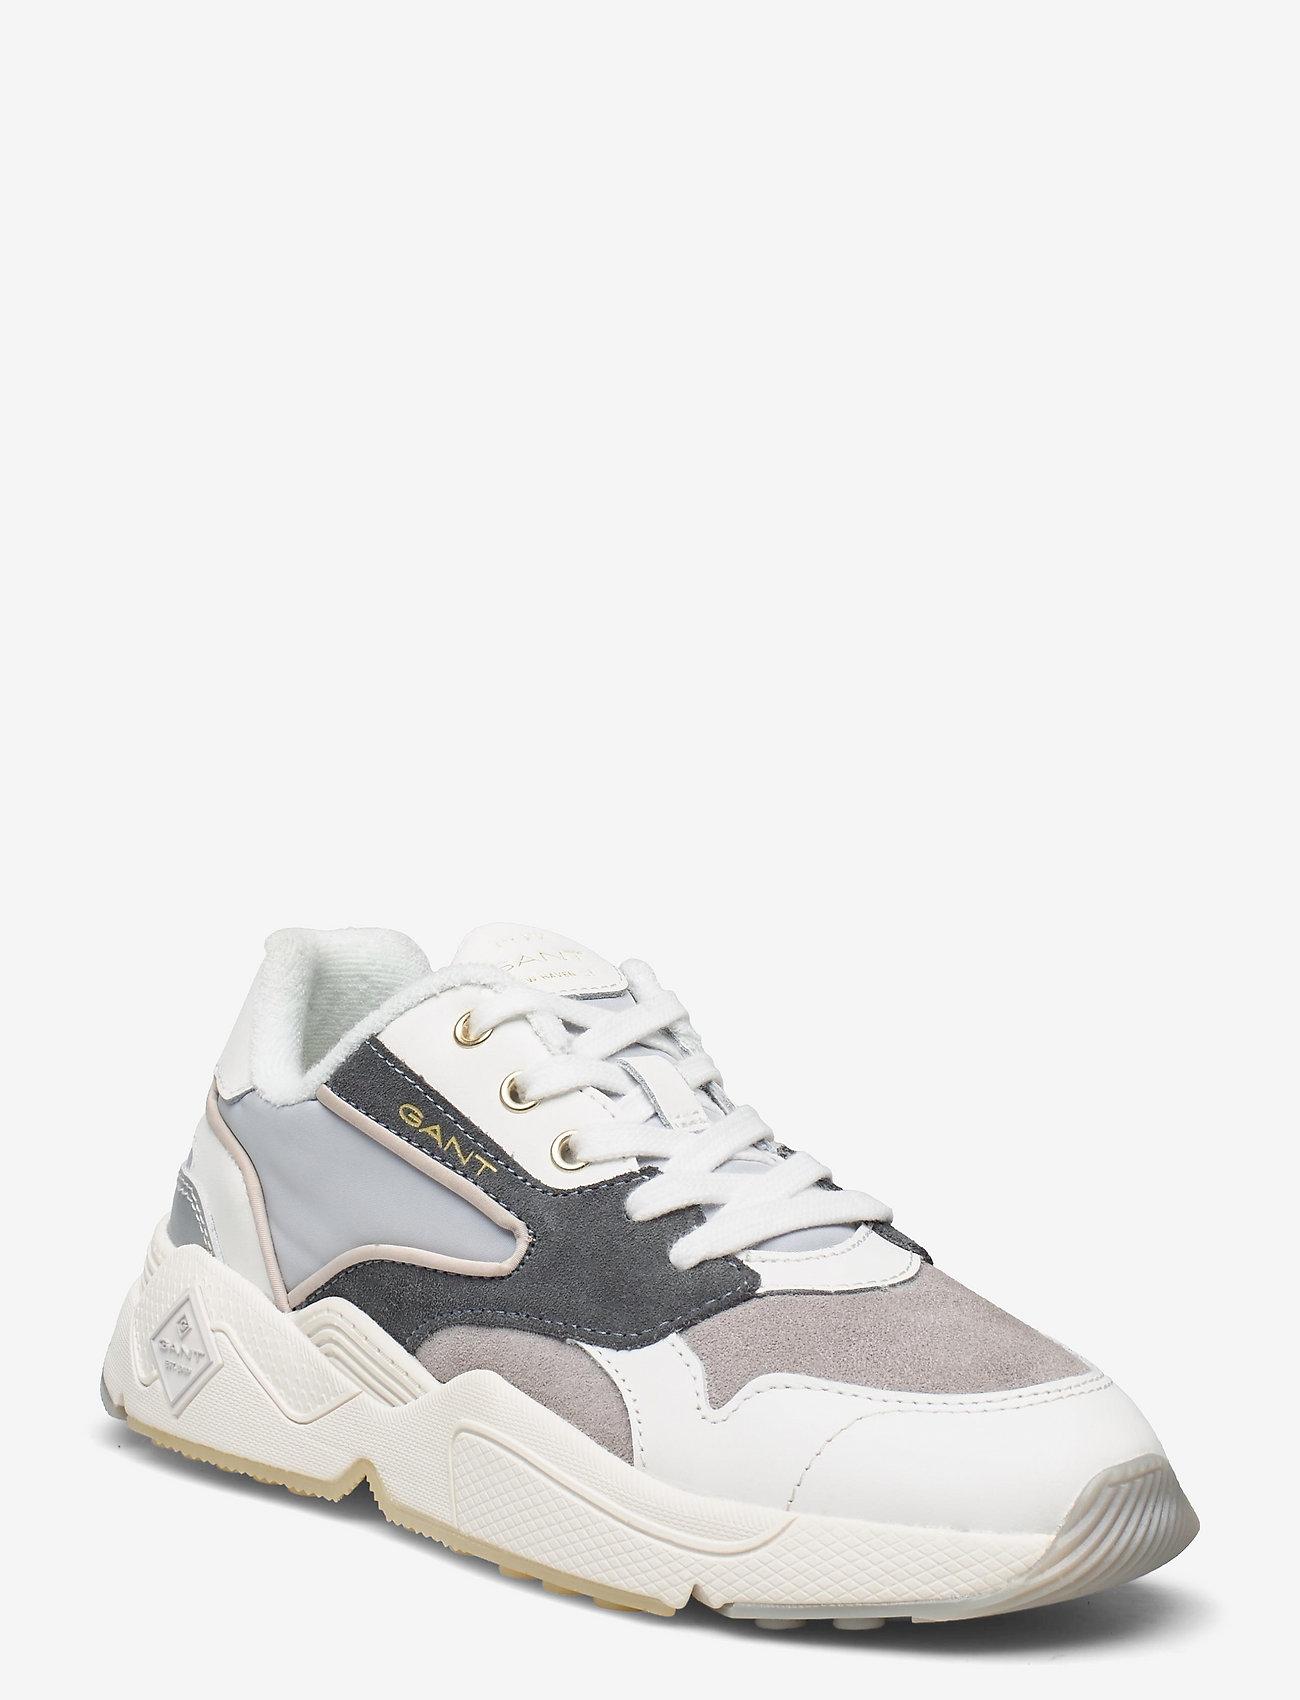 GANT - Nicewill Sneaker - low top sneakers - white/gray - 0